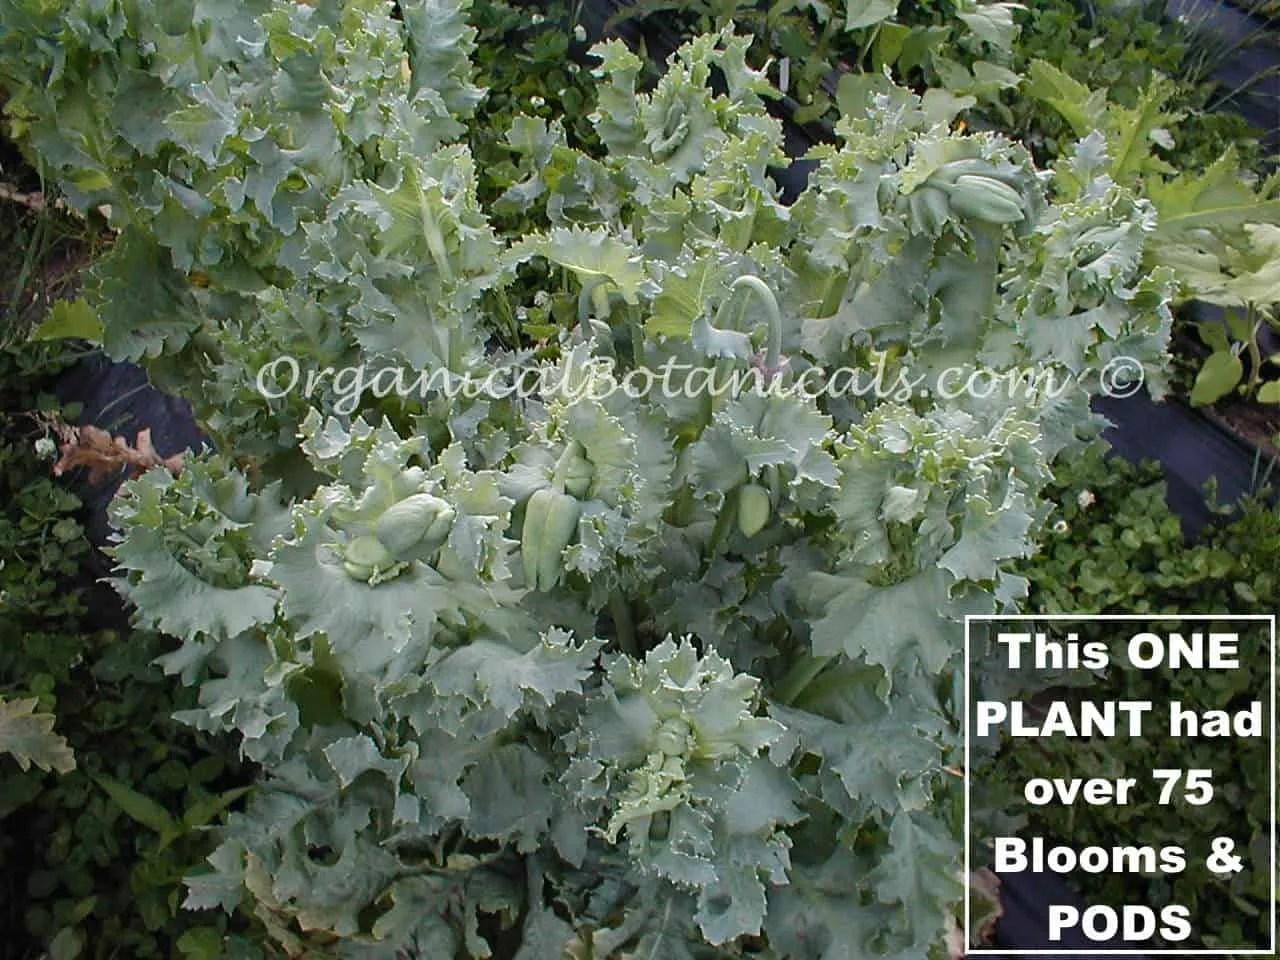 Hungarian Blue Buddha Papaver Somniferum Poppy Seeds Organical